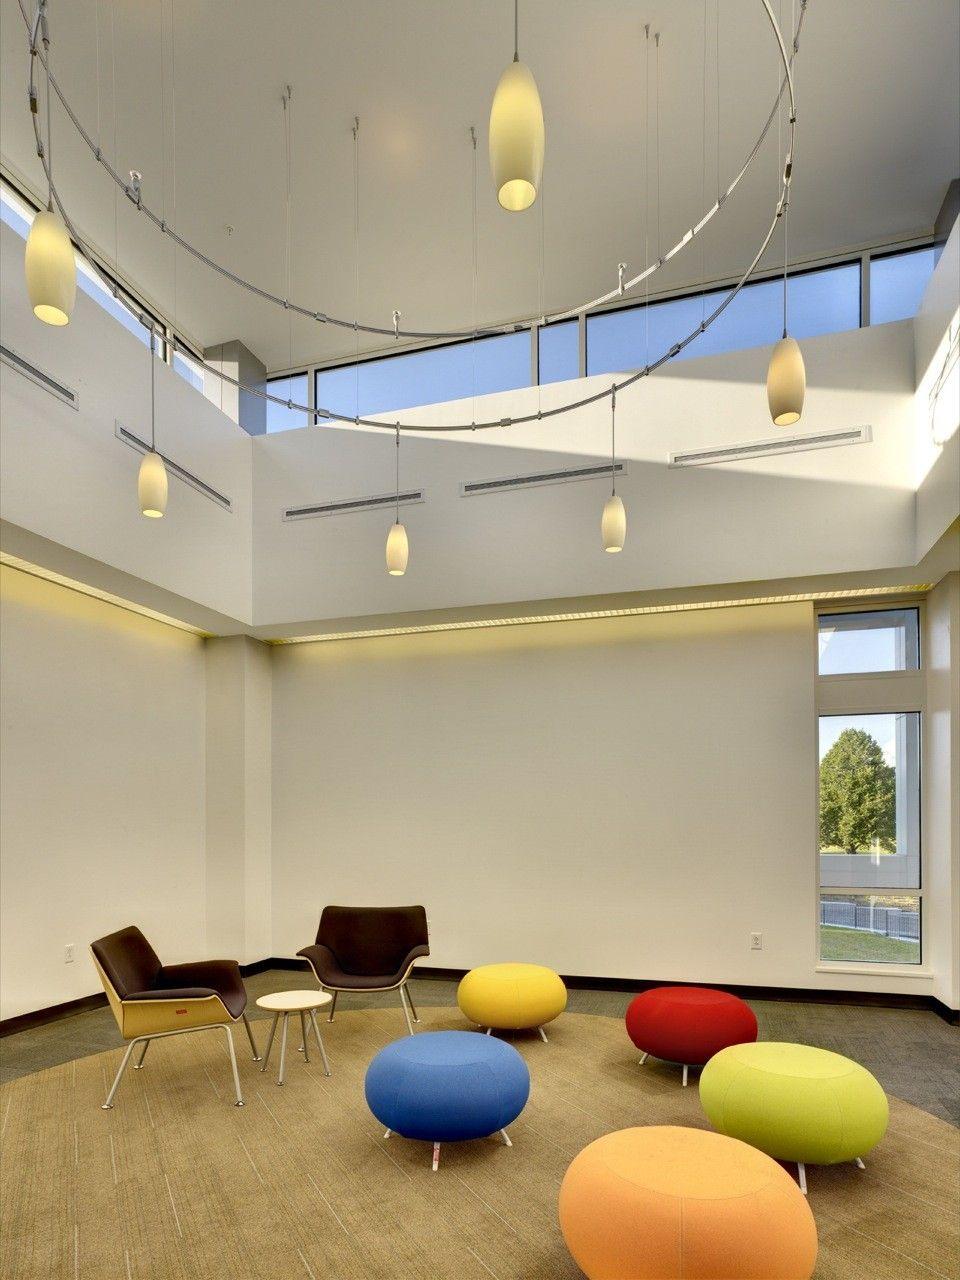 Gallery Of Suny Institute Of Technology Student Center Qpk Design 10 Student Center Design Home Decor